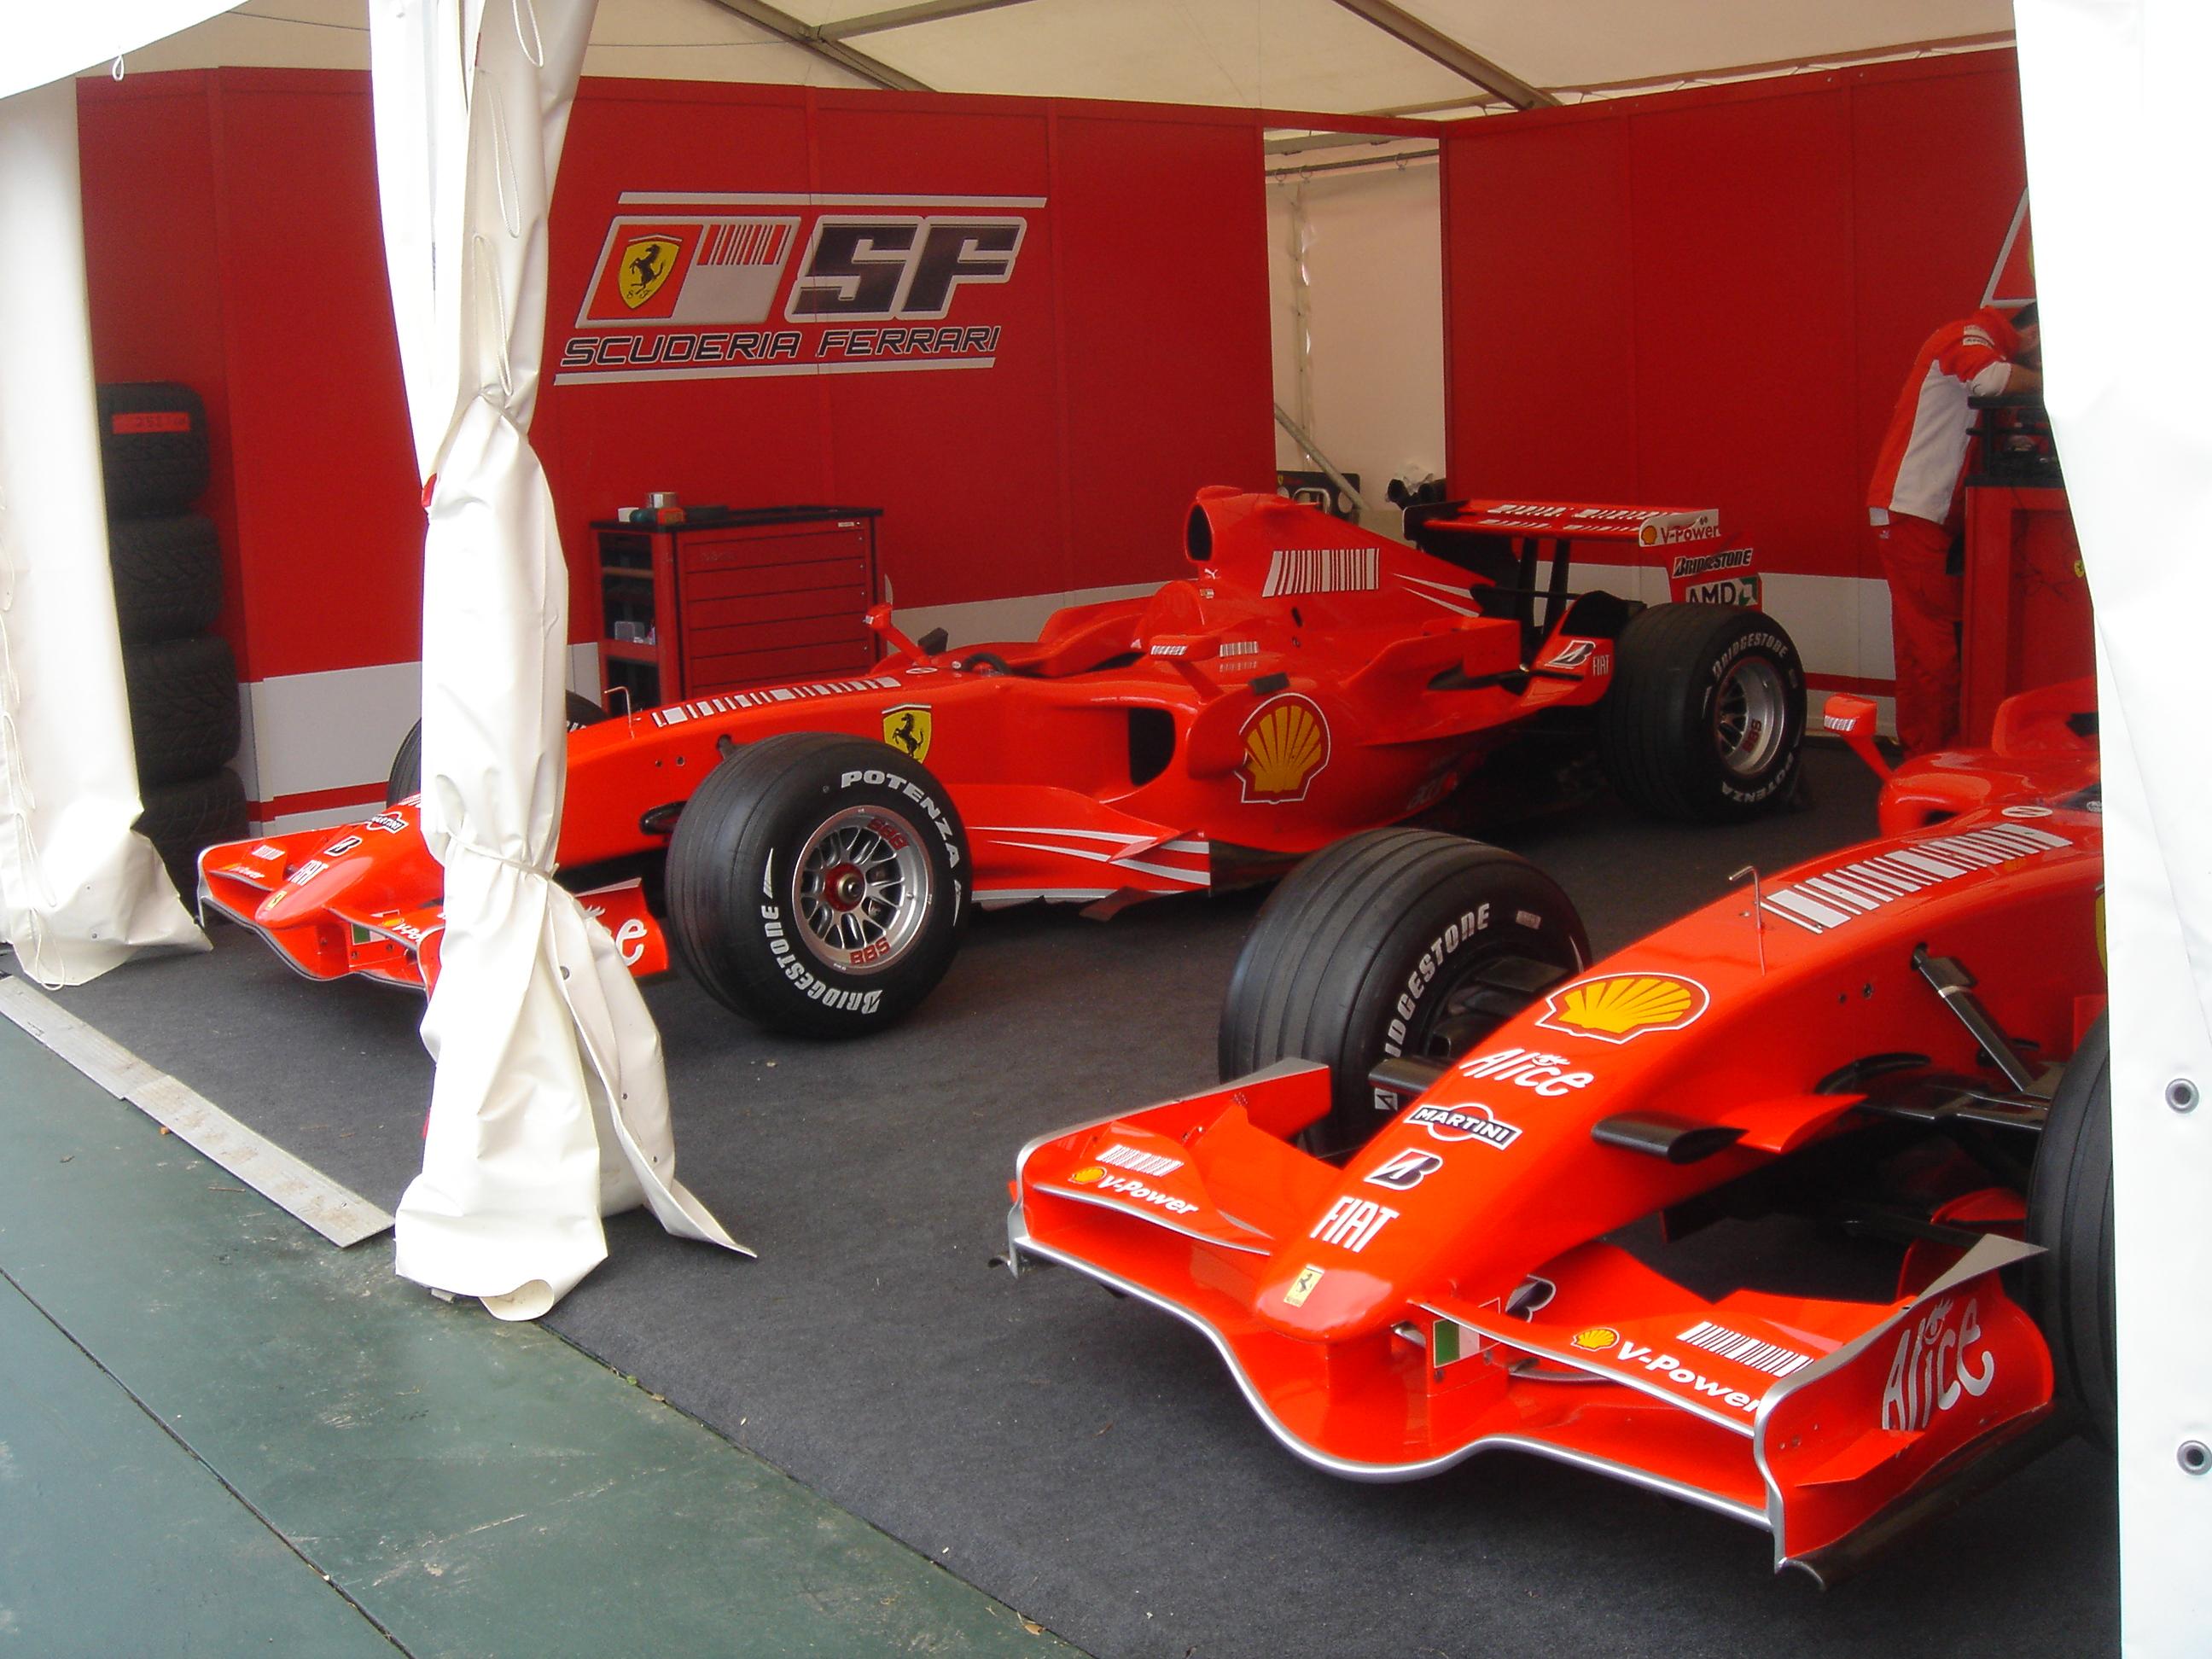 2006 Ferrari f1 Car Ferrari f1 Cars 2006).jpg